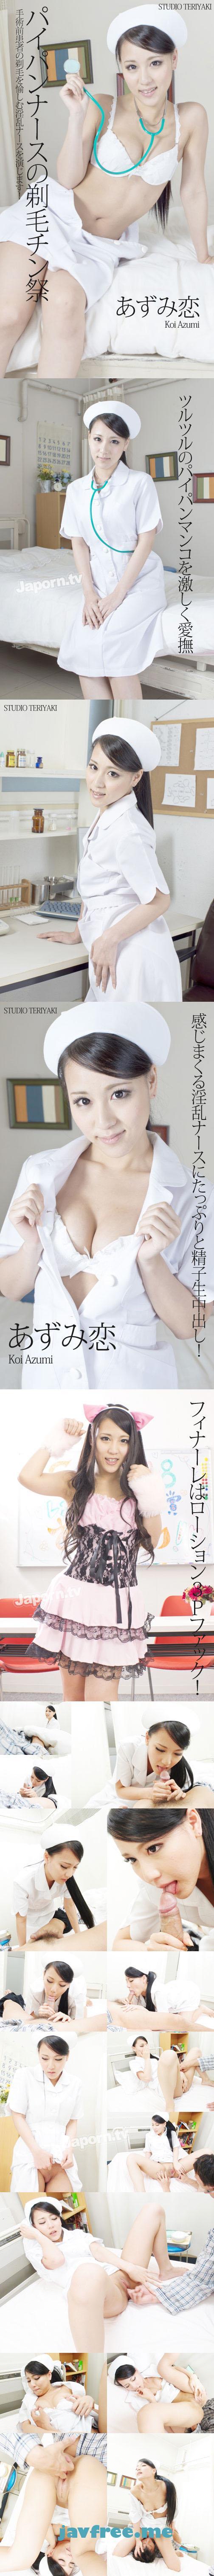 [PT 114] パイパンナースの剃毛チン察 : あずみ恋  あずみ恋 Ren Azumi PT